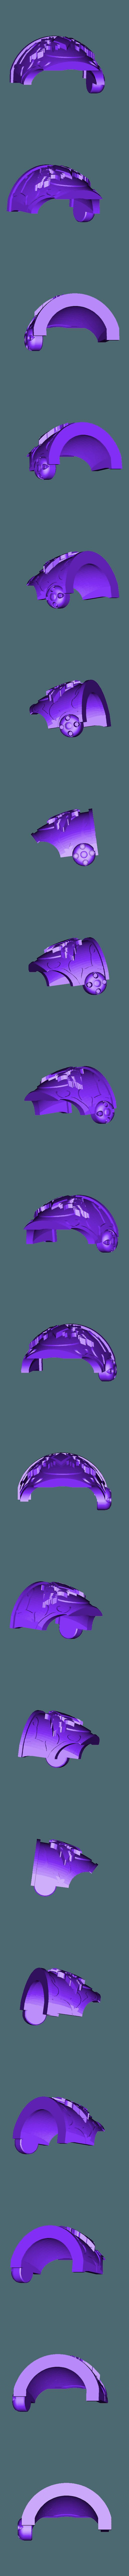 Tartaros_-_Wolf_2.stl Download free STL file Legion of the Wolf - Marine Upgrade Pack • 3D printer object, GarinC3D